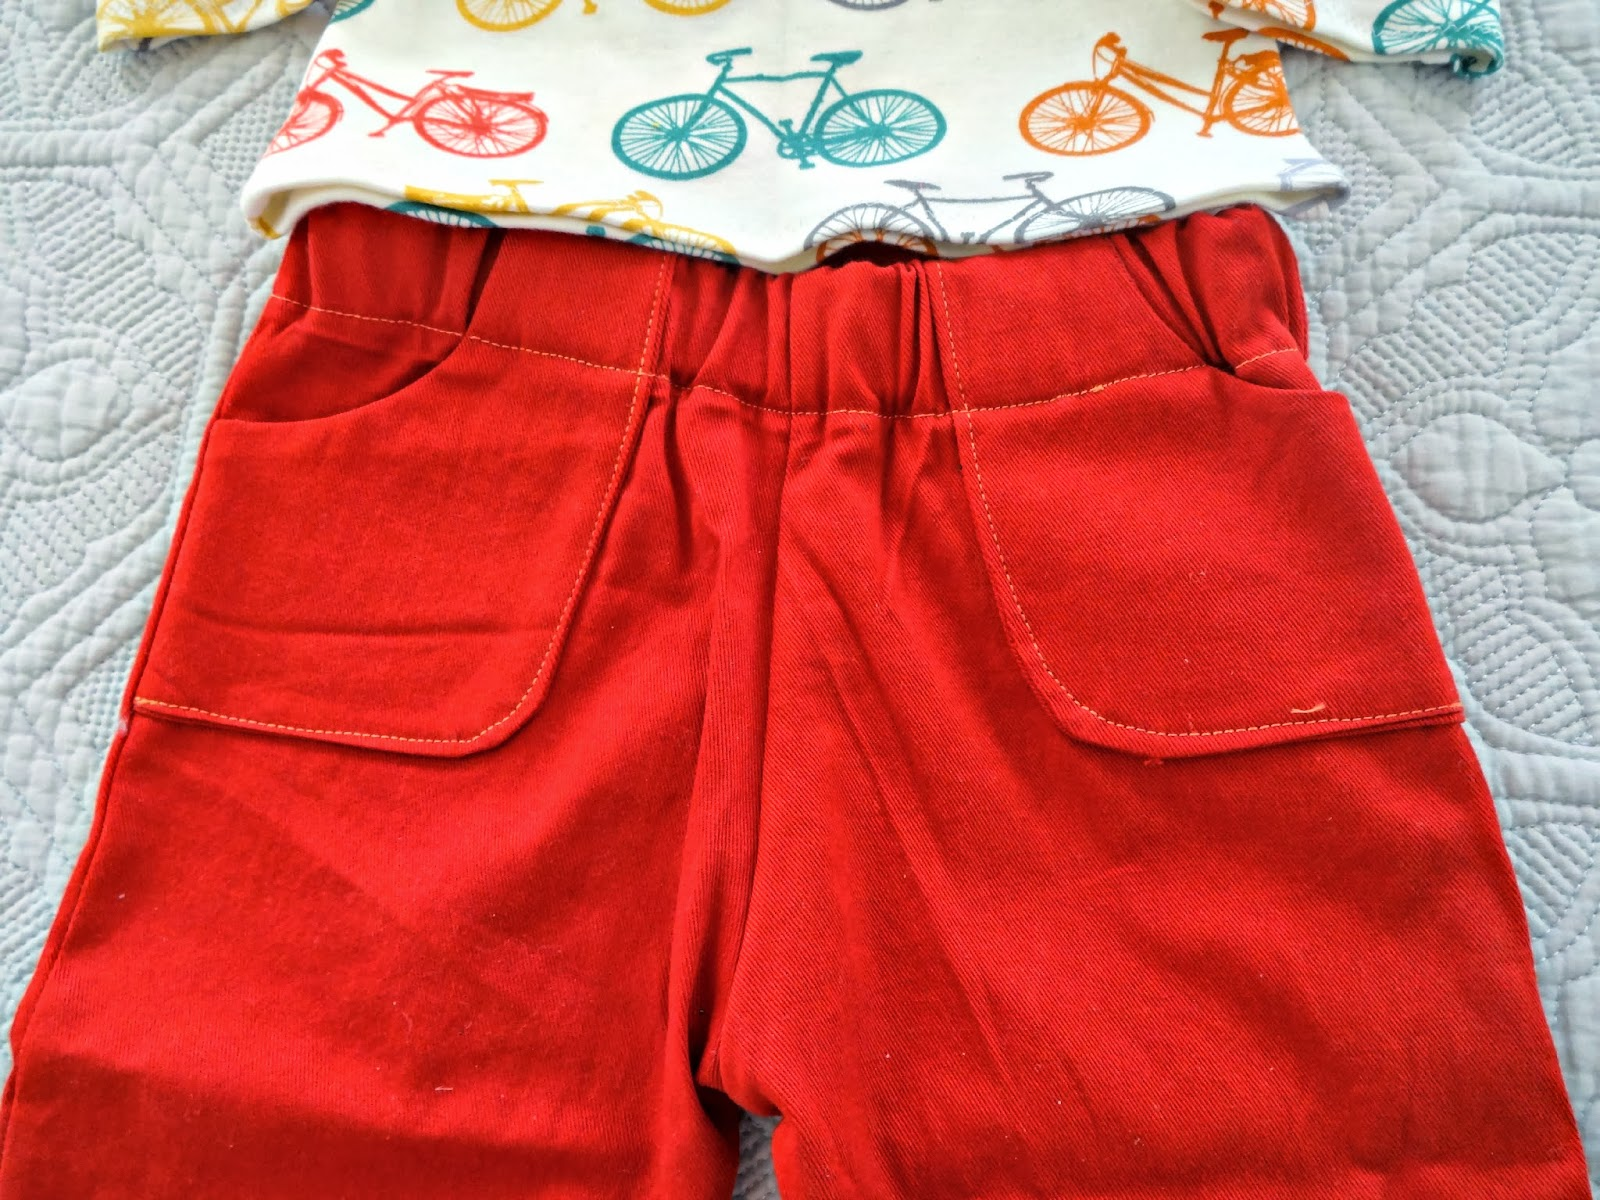 Seemesew Rust Colored Pants And Bikes